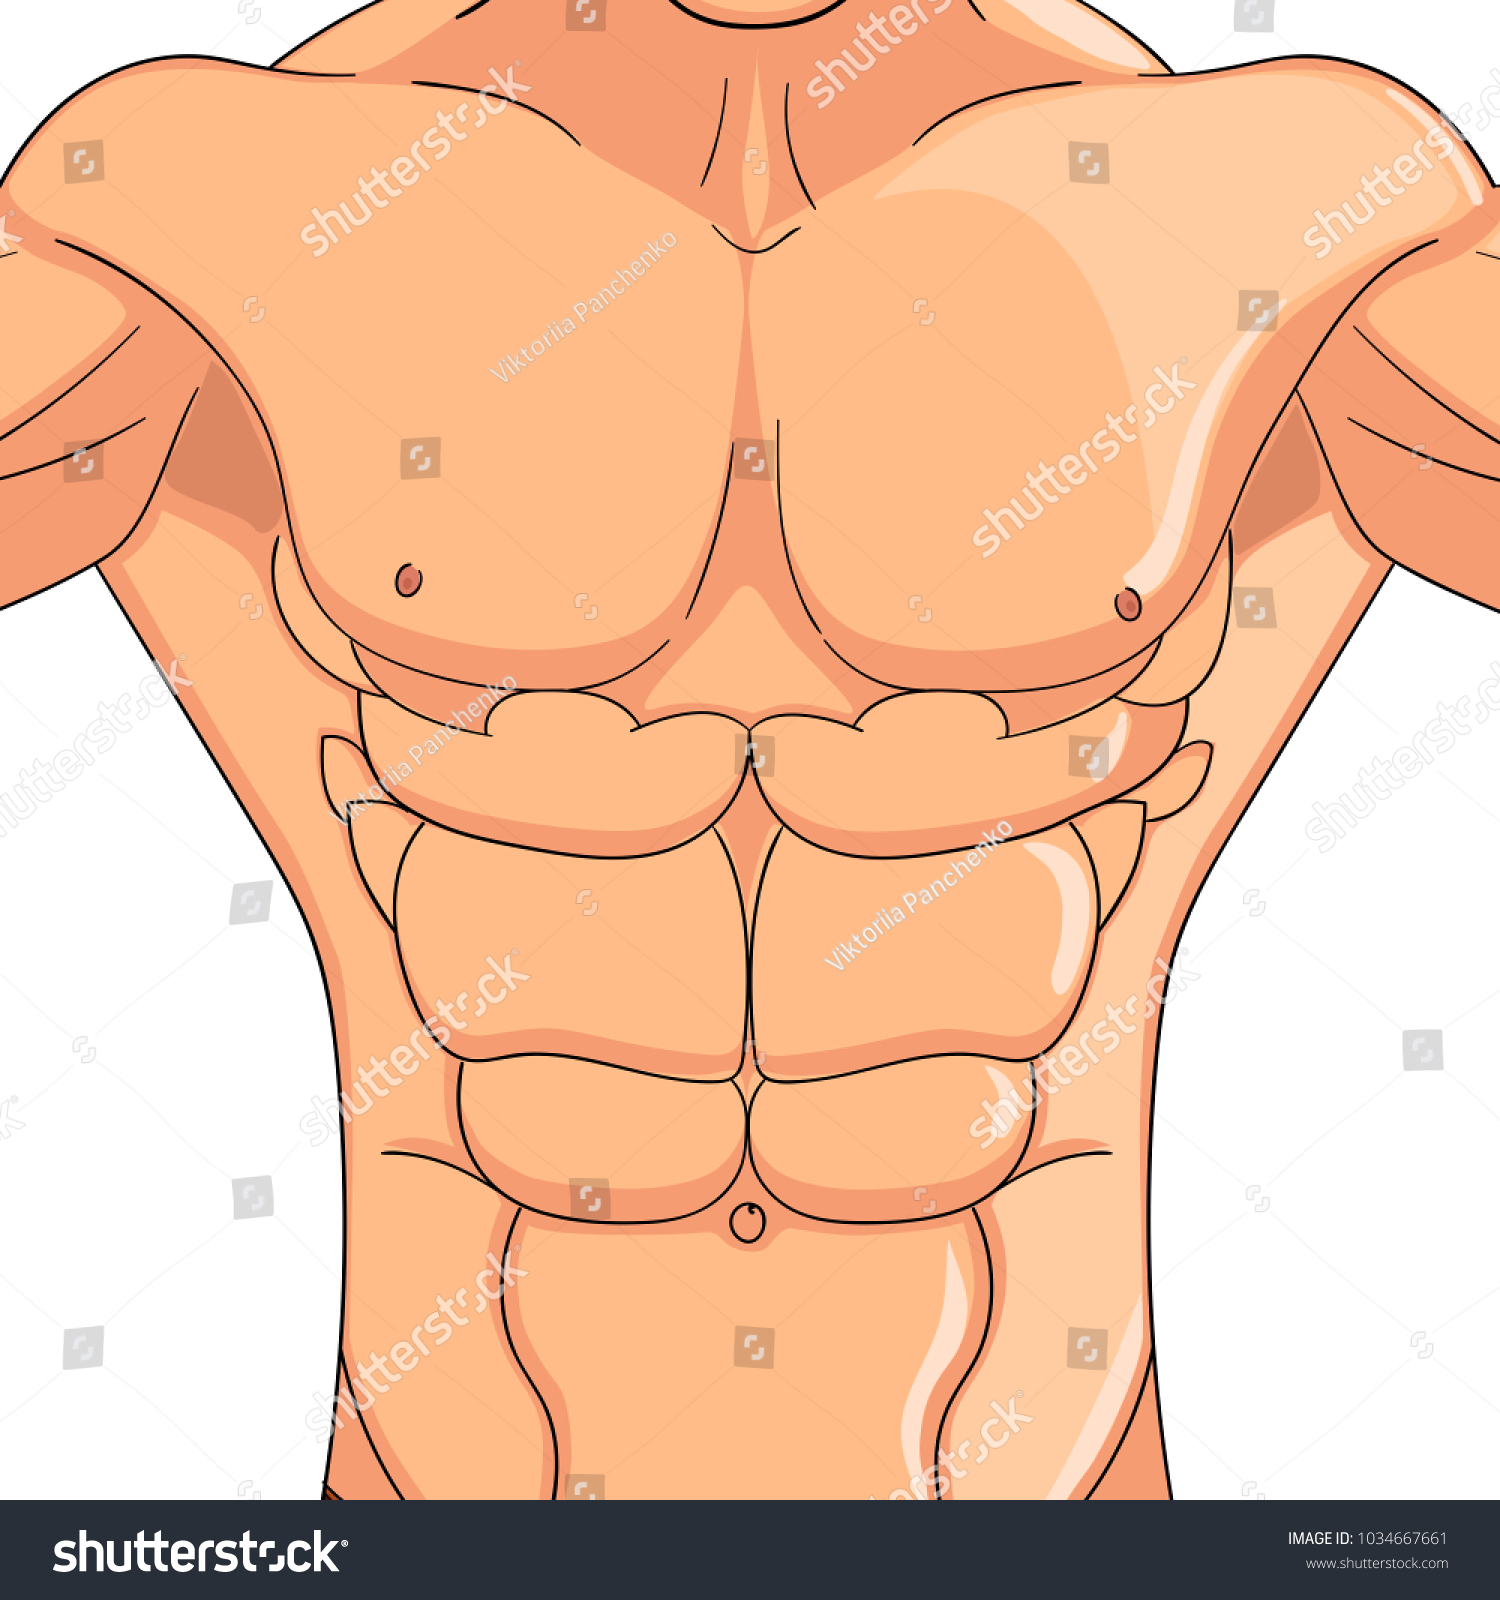 Male Press Body Athlete Bodybuilder Anatomy Stock Vector 1034667661